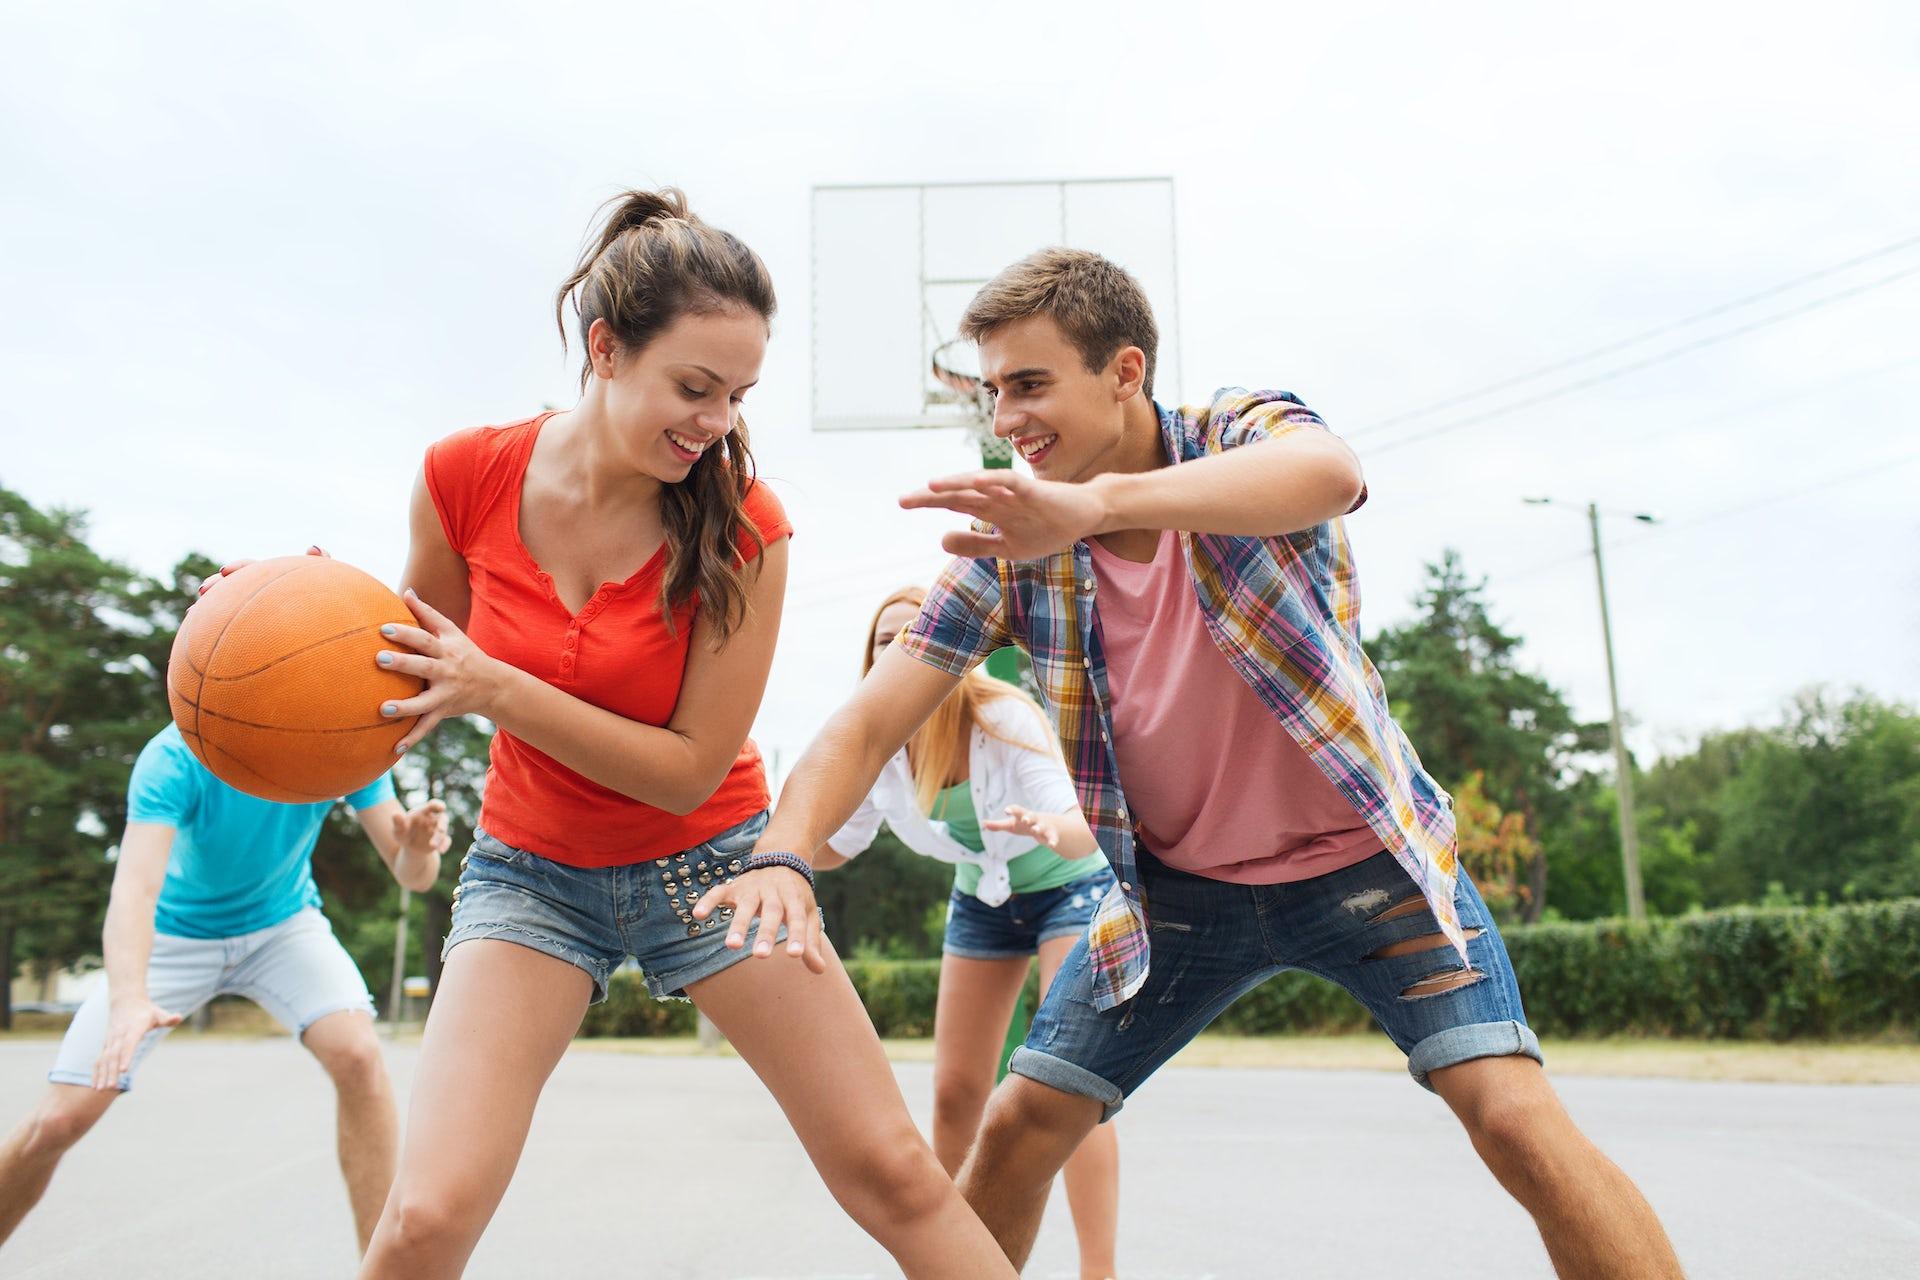 Teens getting it on